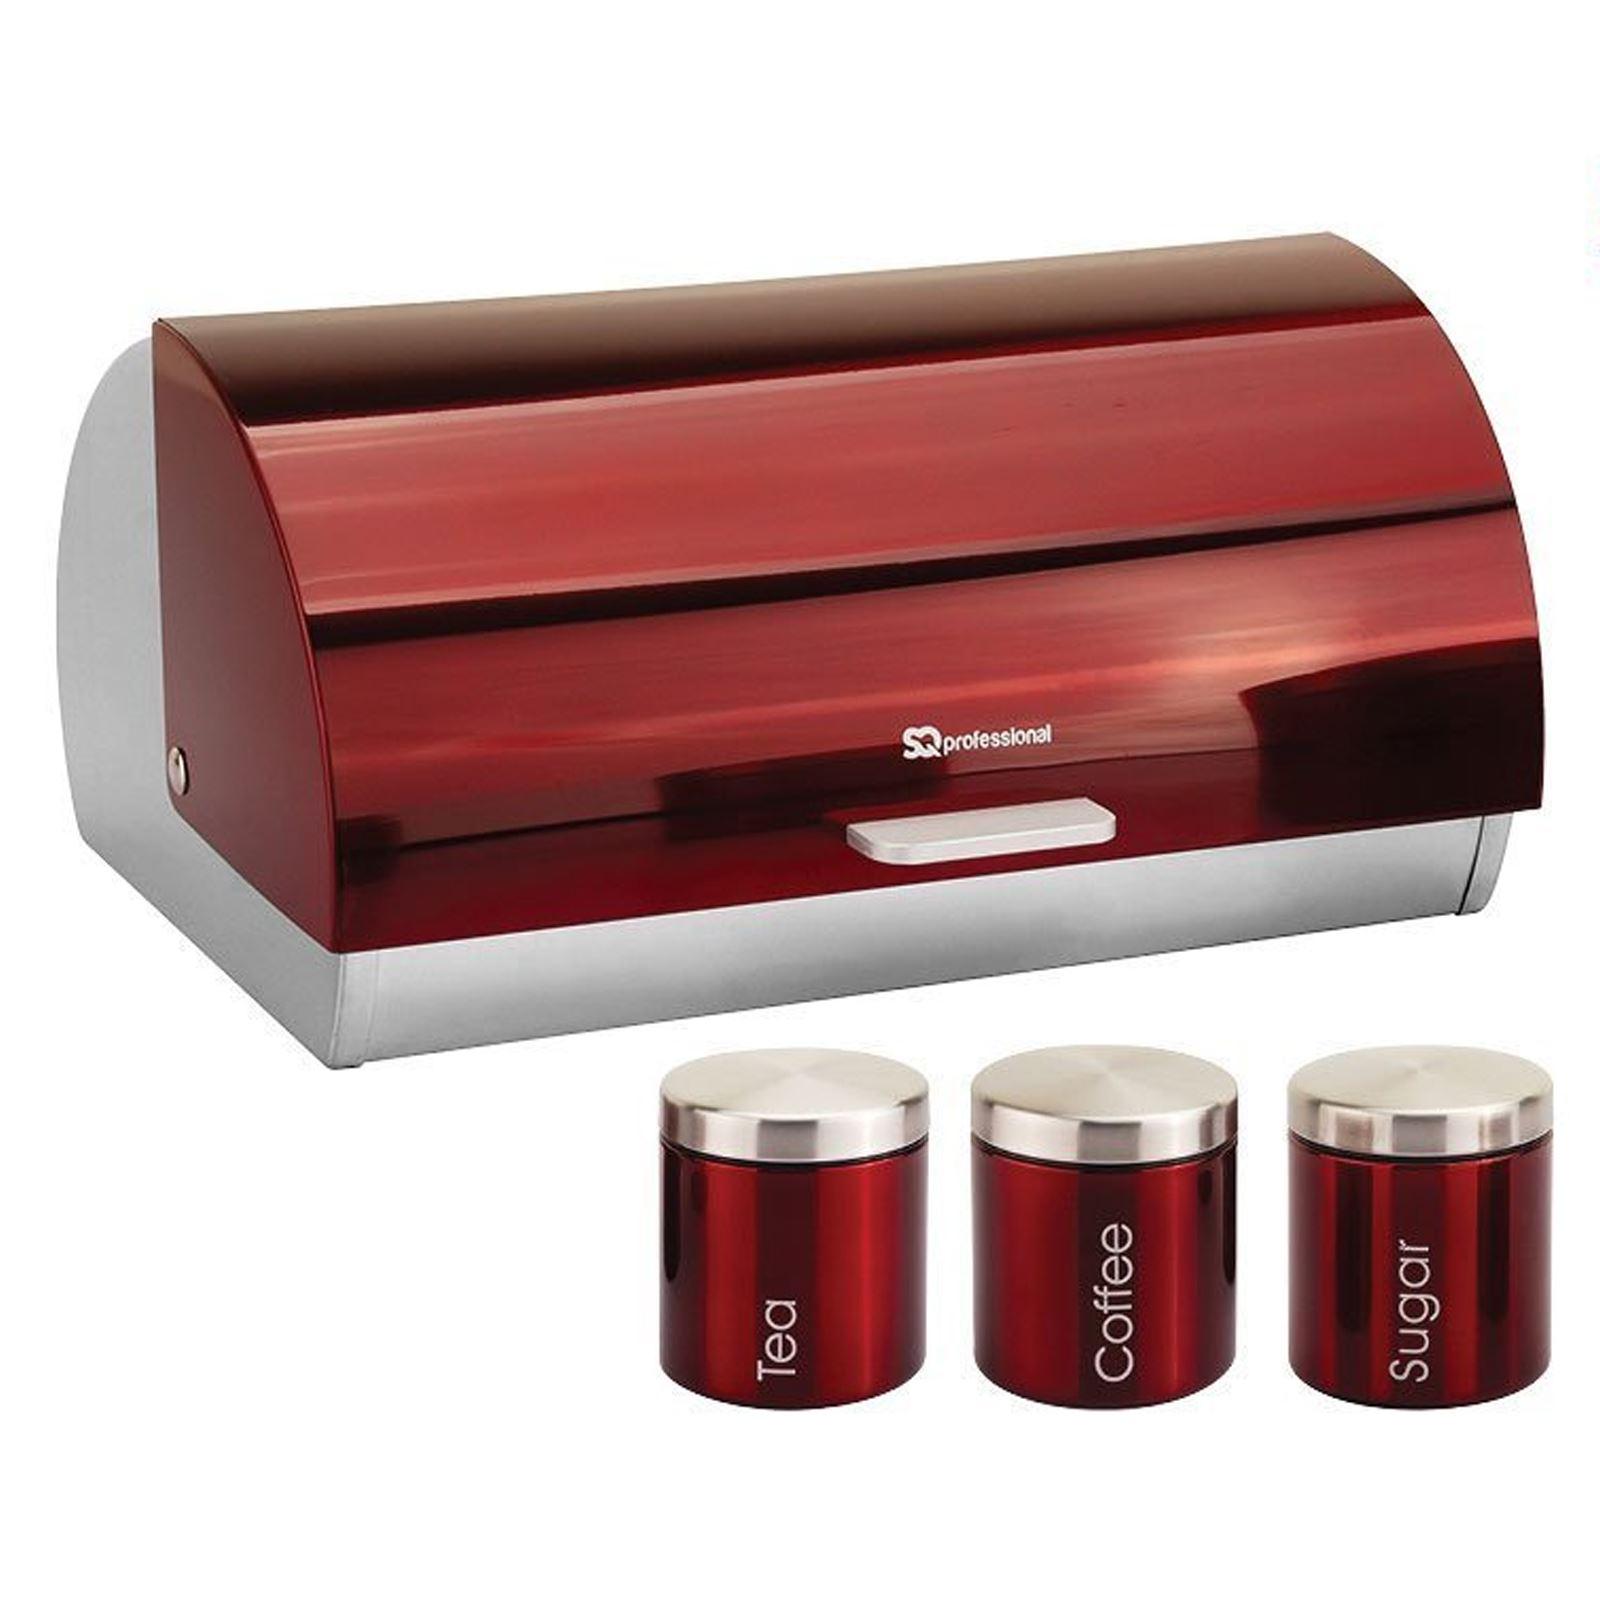 Metallic-Roll-Top-Bread-Bin-Tea-Coffee-Sugar-Jar-Canister-Sets-Kitchen-Storage thumbnail 23